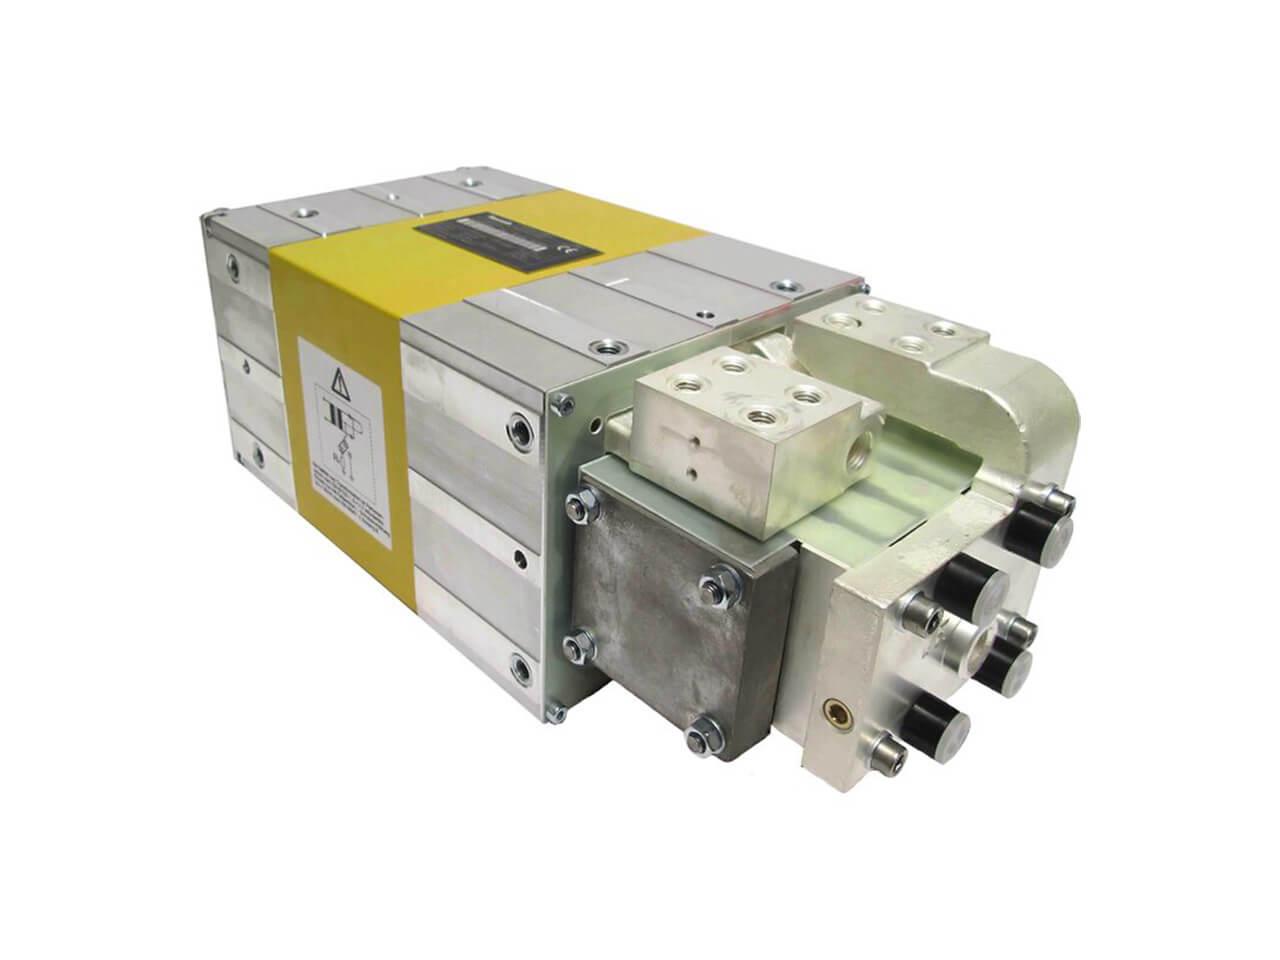 Medium Frequency Welding Transformer – PSG 3200.00 A